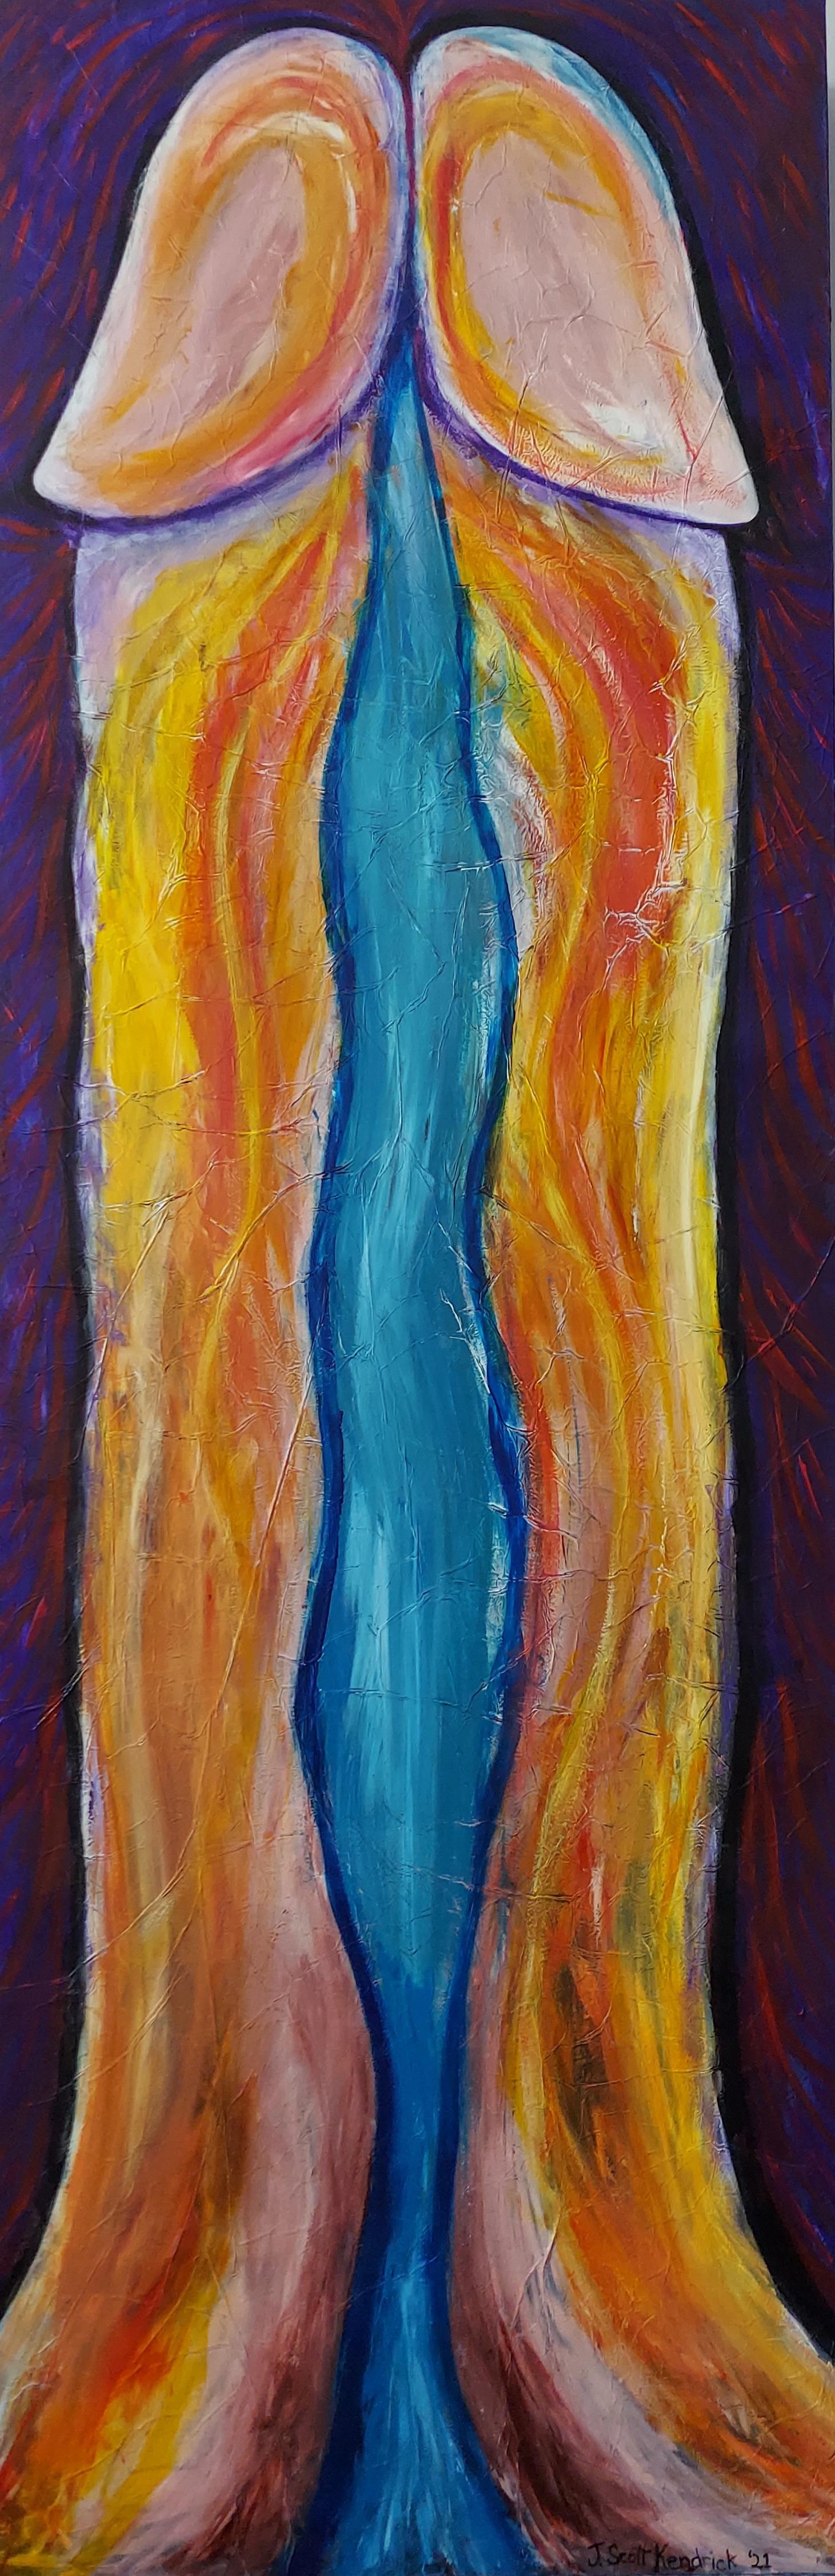 A River Runs Through It artwork by J Scott Kendrick - art listed for sale on Artplode